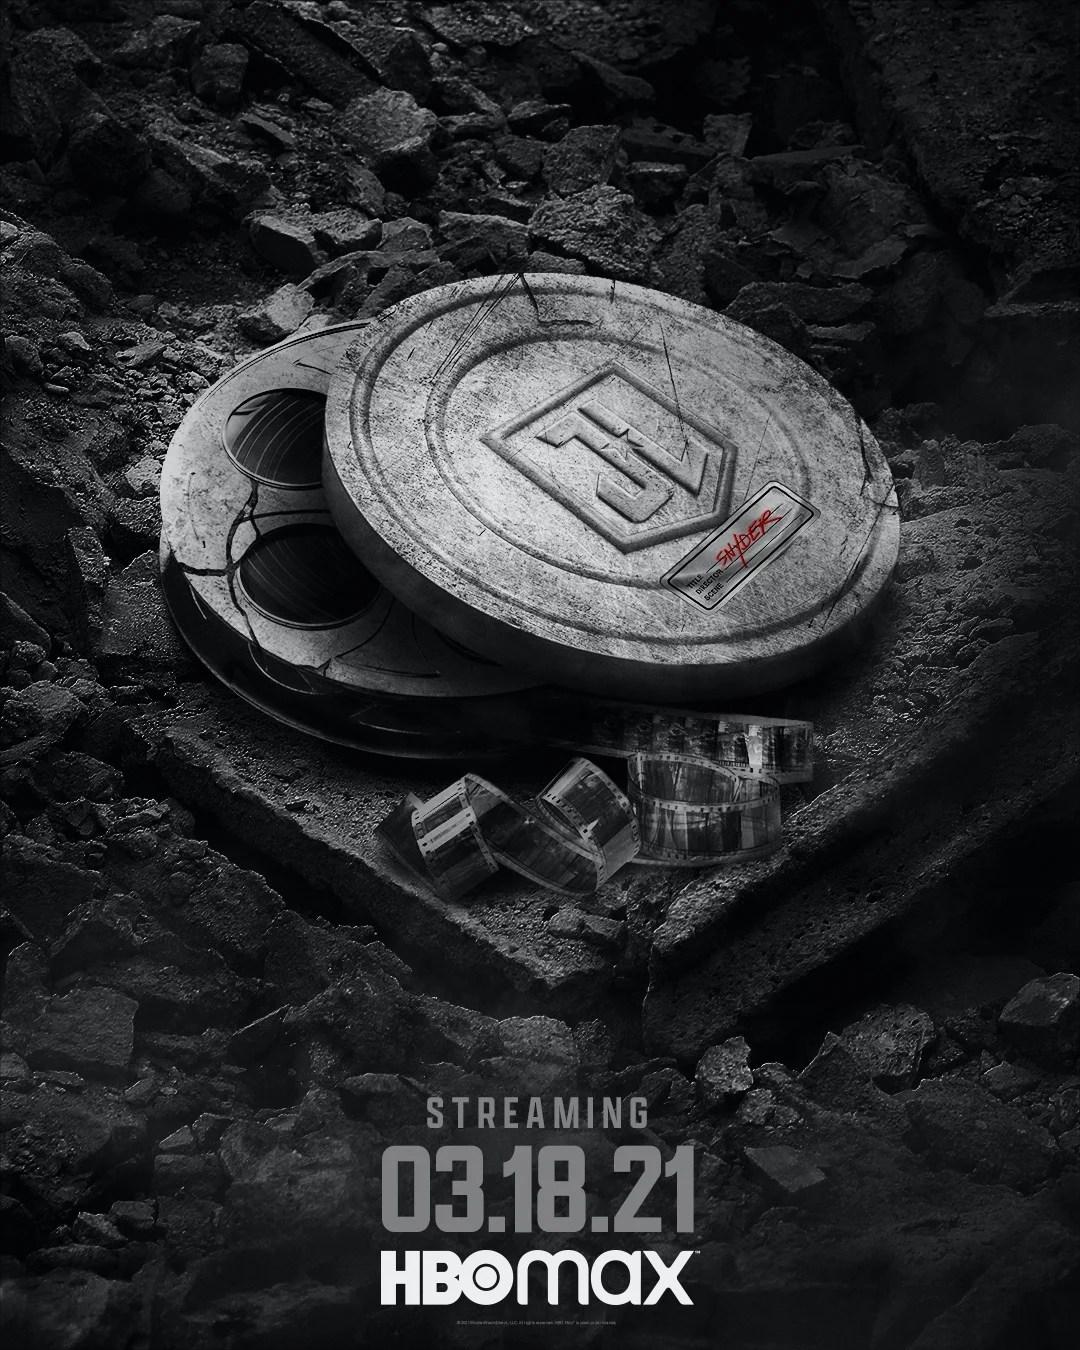 Justice League En Streaming : justice, league, streaming, Snyder's, Justice, League, Release, Confirmed